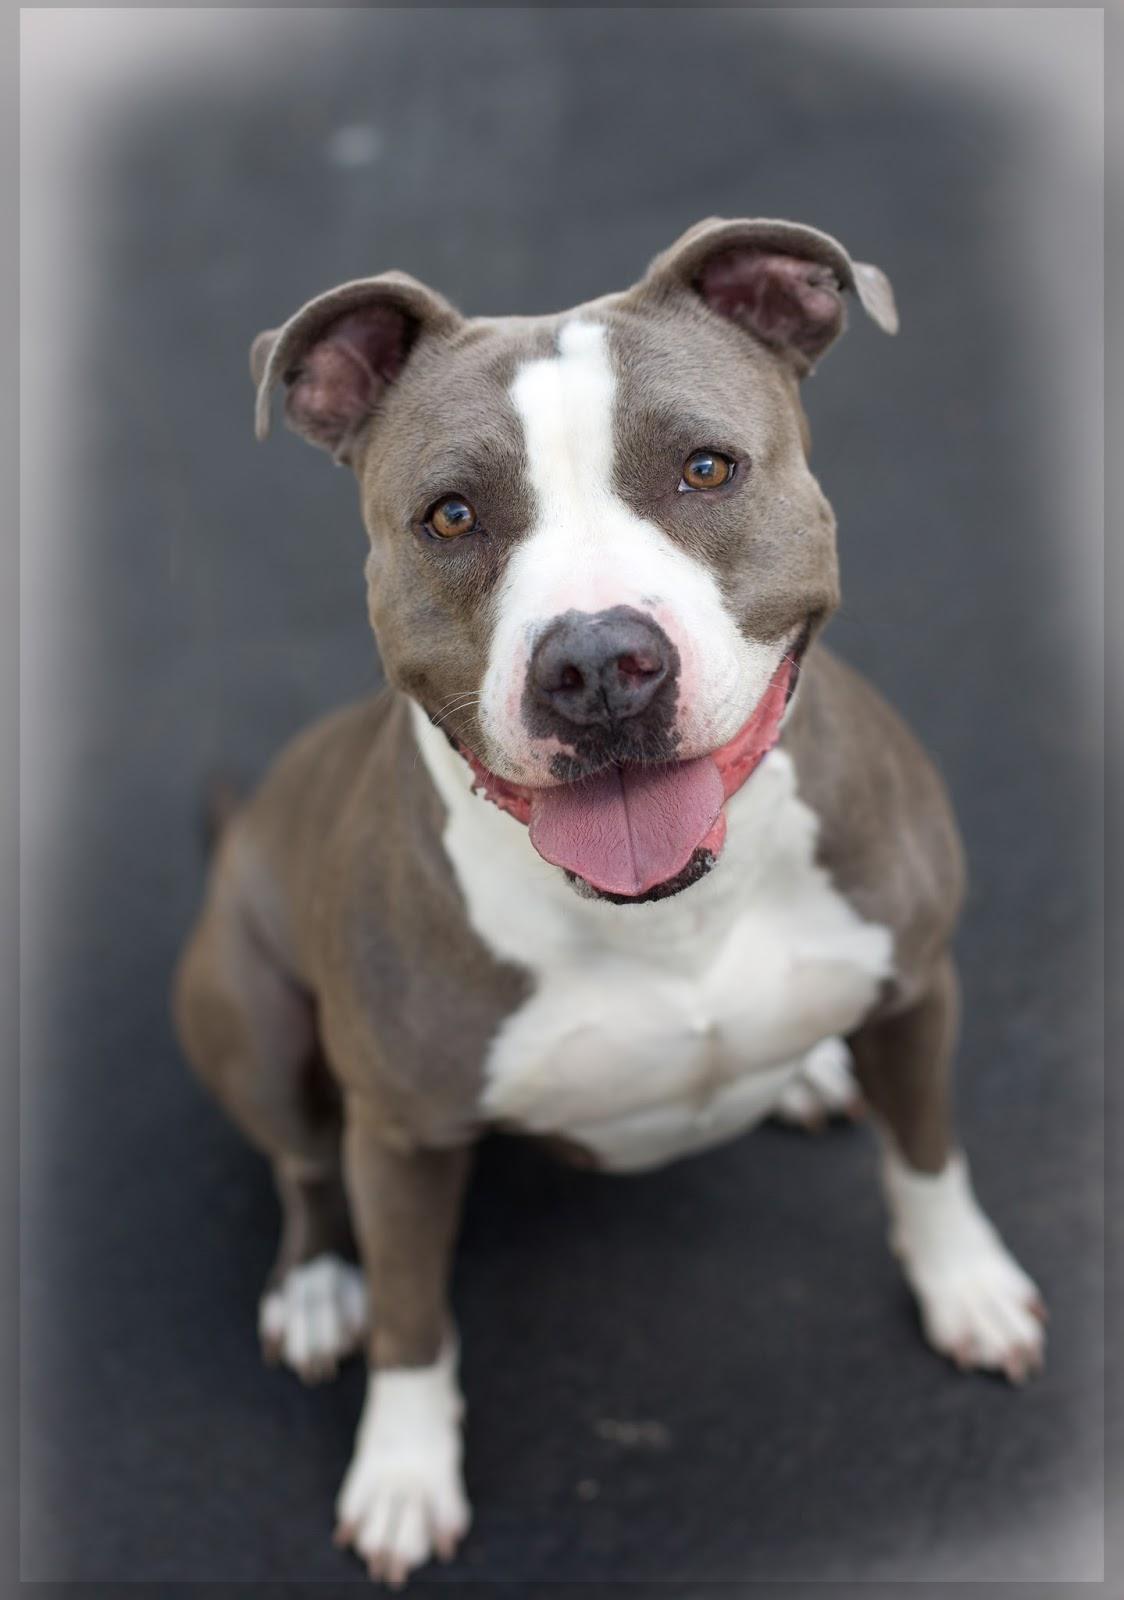 Popular Grey Chubby Adorable Dog - pitmix1  Snapshot_249817  .jpg